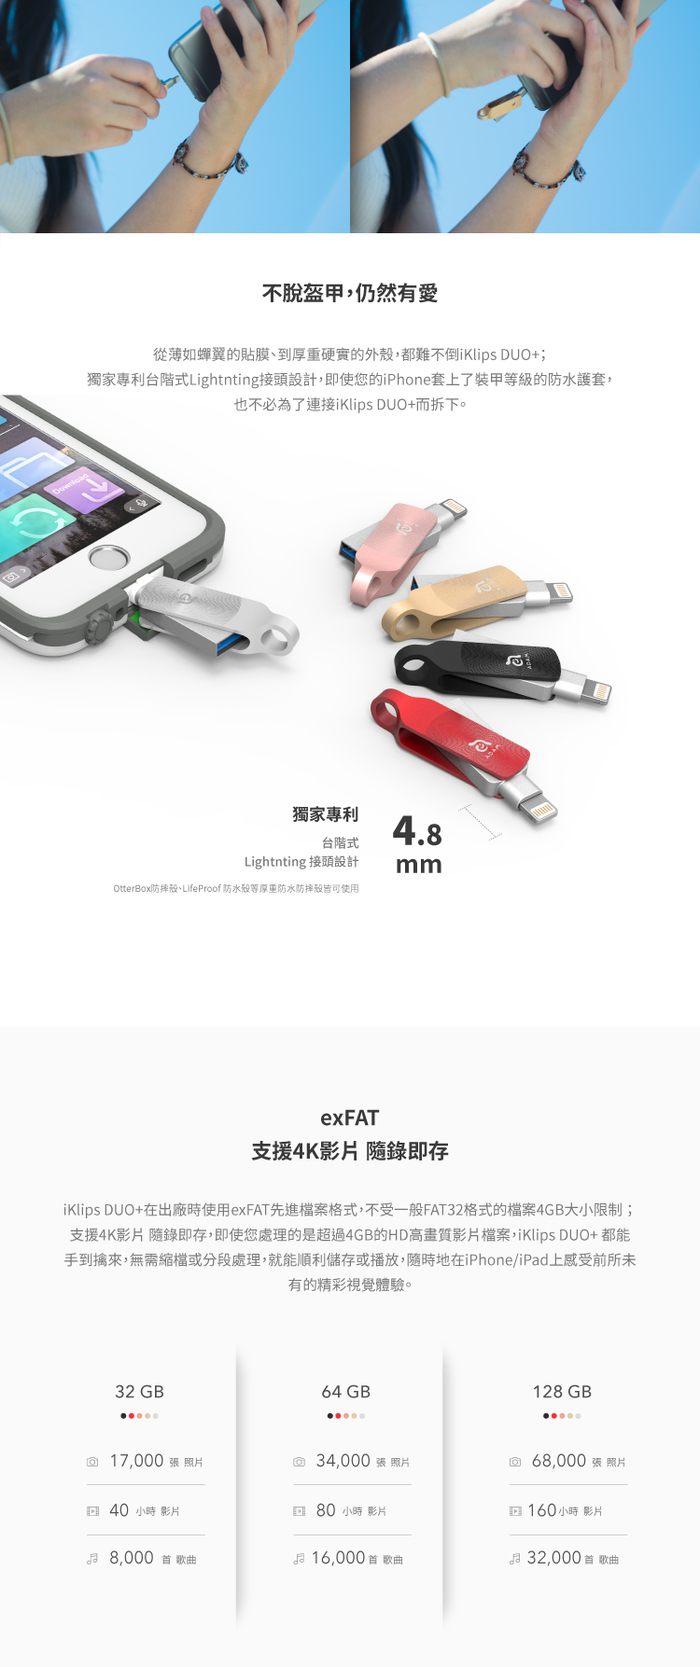 ADAM|iKlips DUO+ 64GB 蘋果iOS USB3.1 旋轉雙向隨身碟 銀